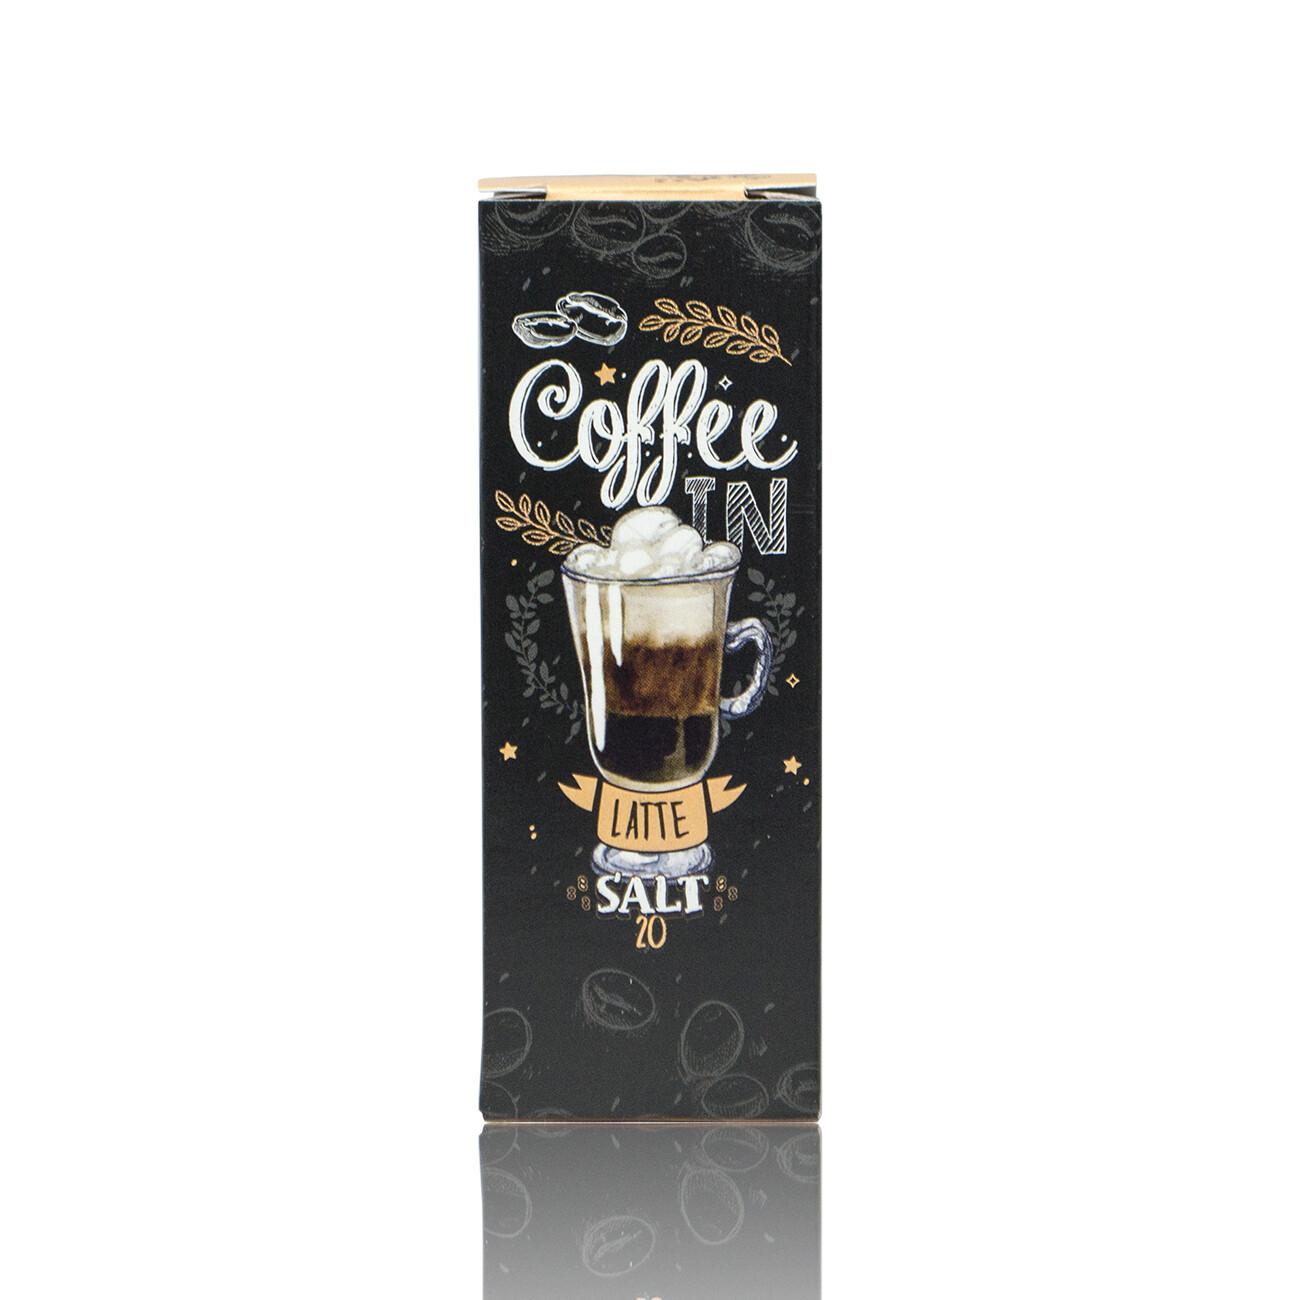 COFFE-IN SALT: LATTE 20MG STRONG